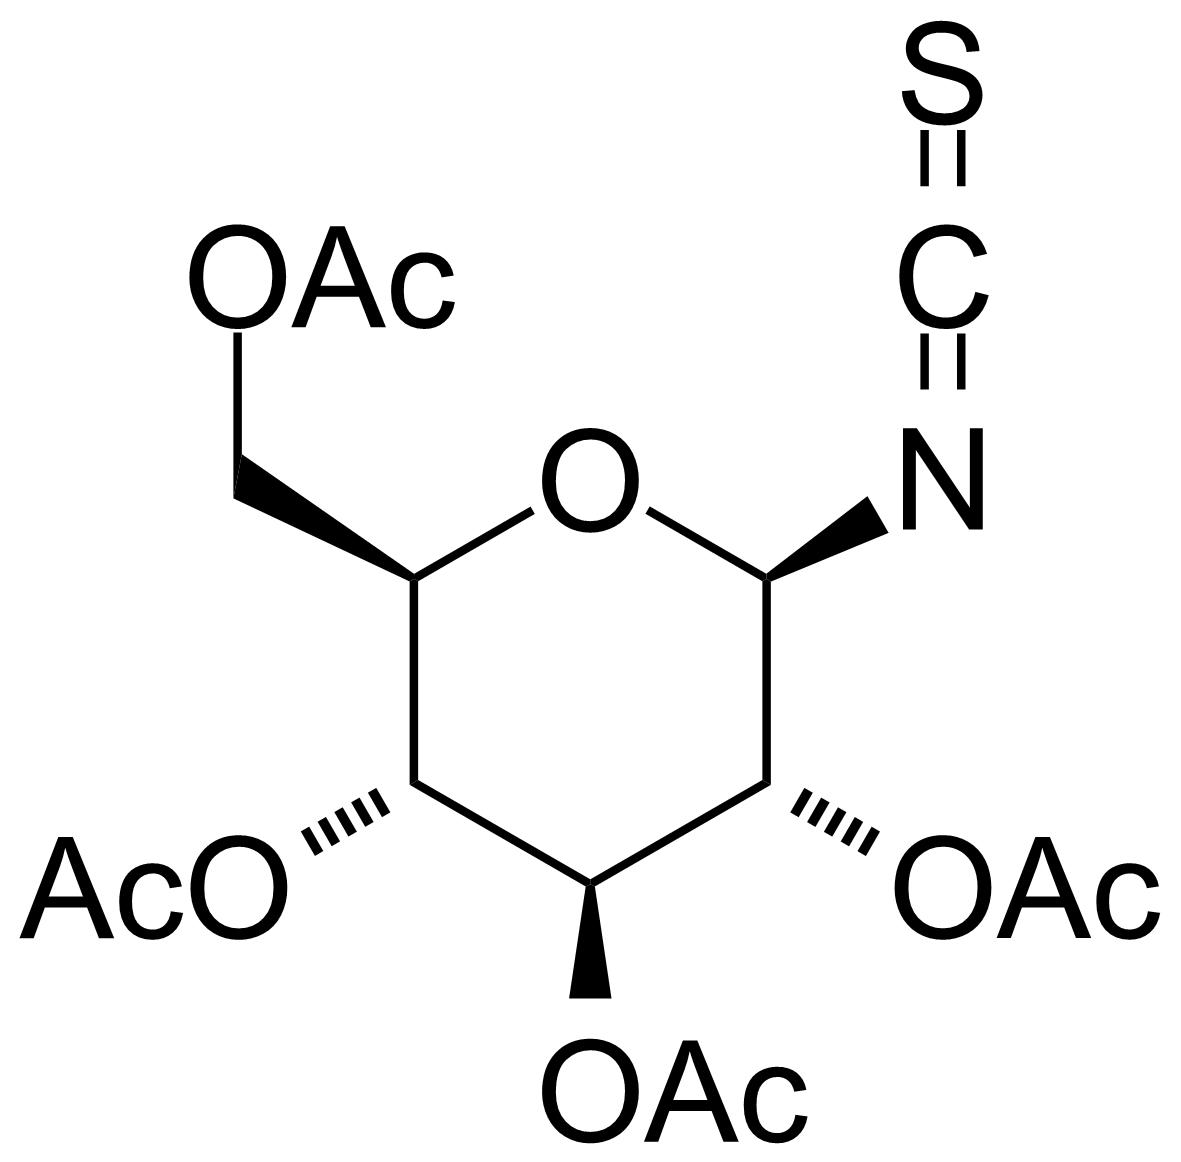 Structure of 2,3,4,6-Tetra-O-acetyl-b-D-glucopyranosyl isothiocyanate